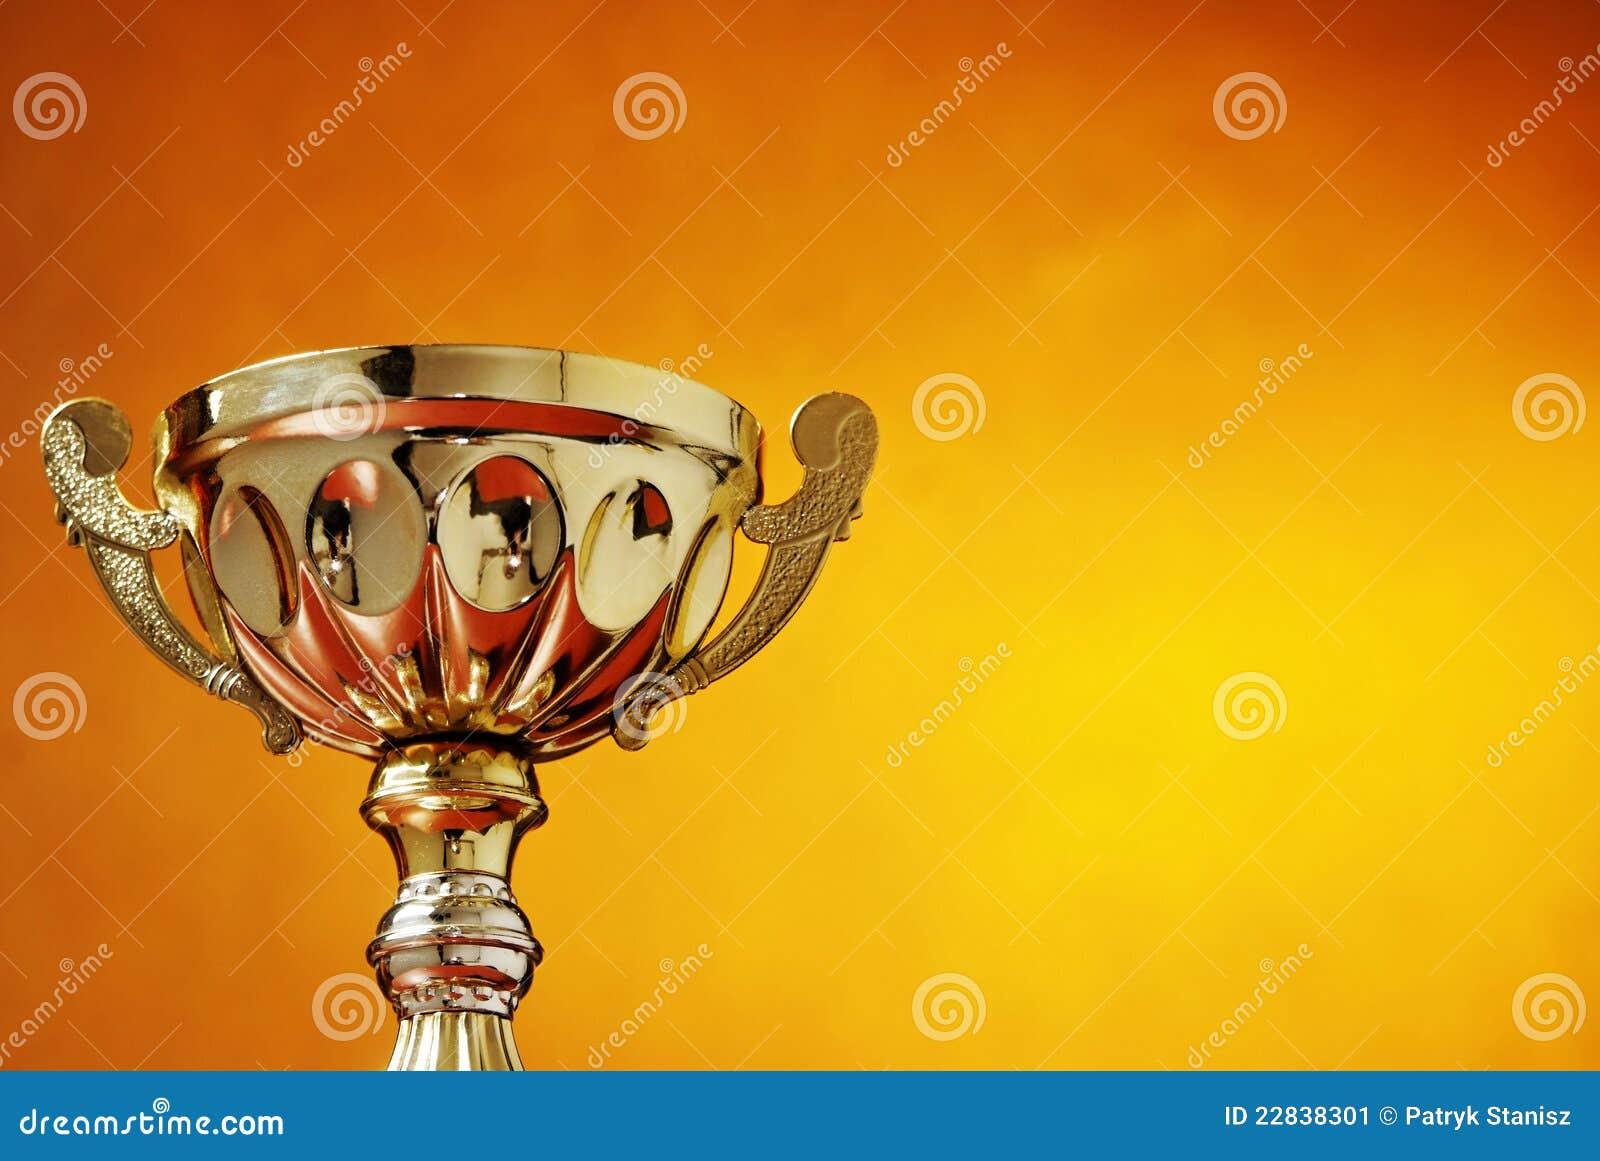 Trophy cup on orange background